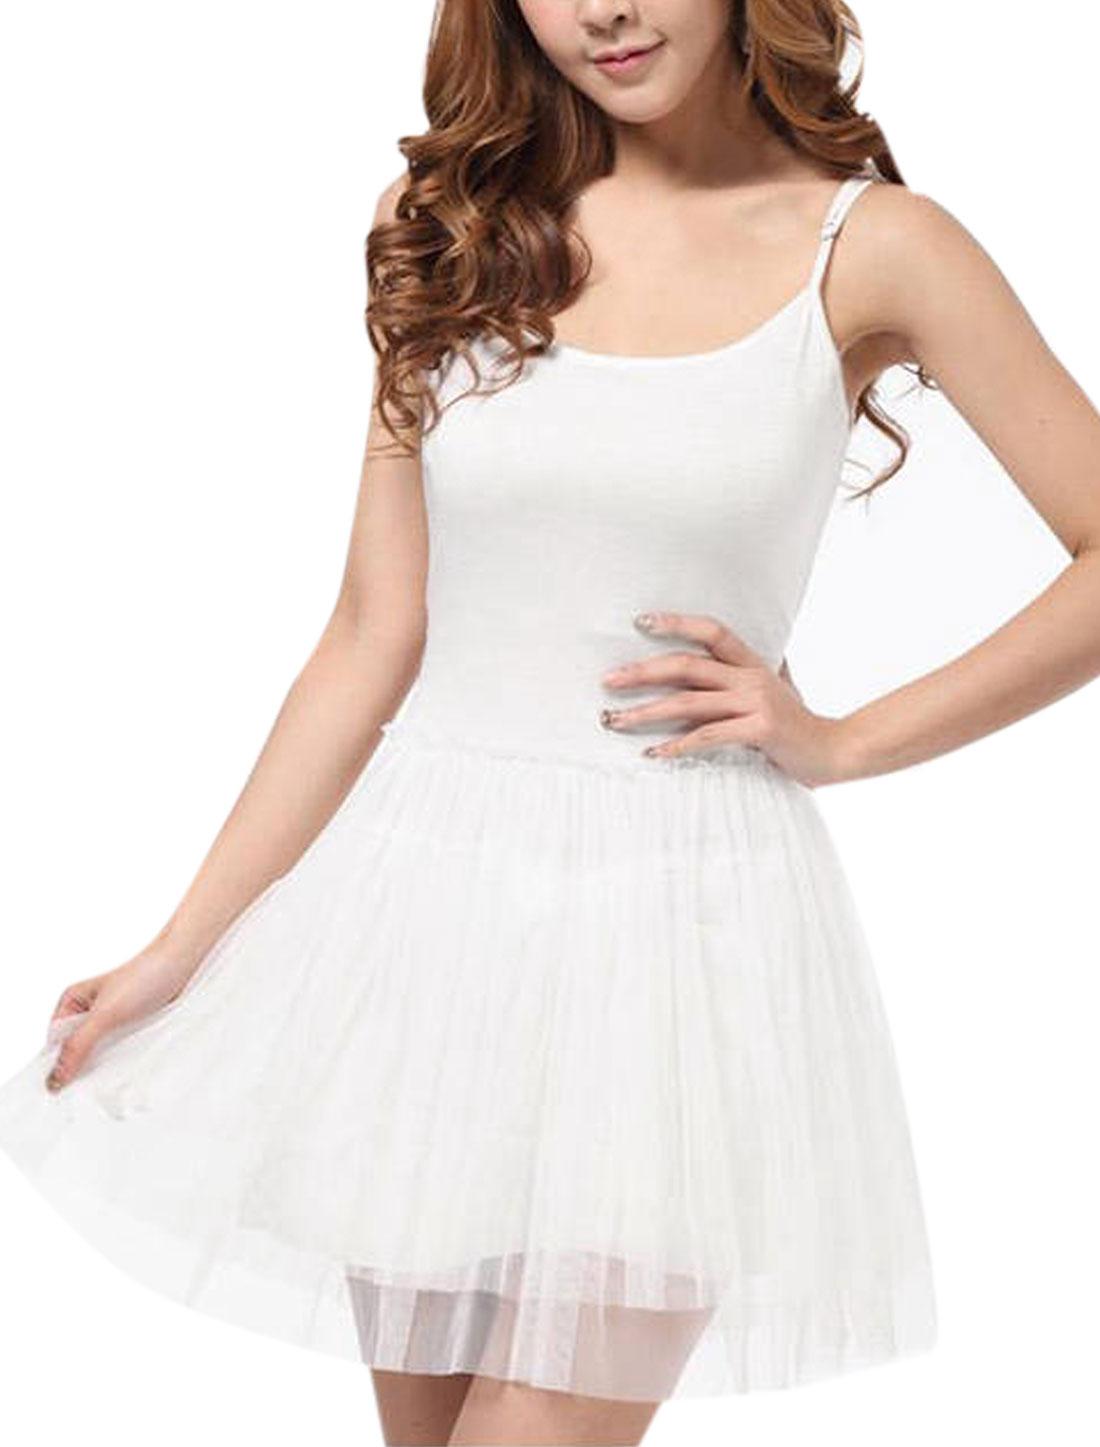 Lady Adjustable Spaghetti Strap Mesh Spliced Skater Dress White S